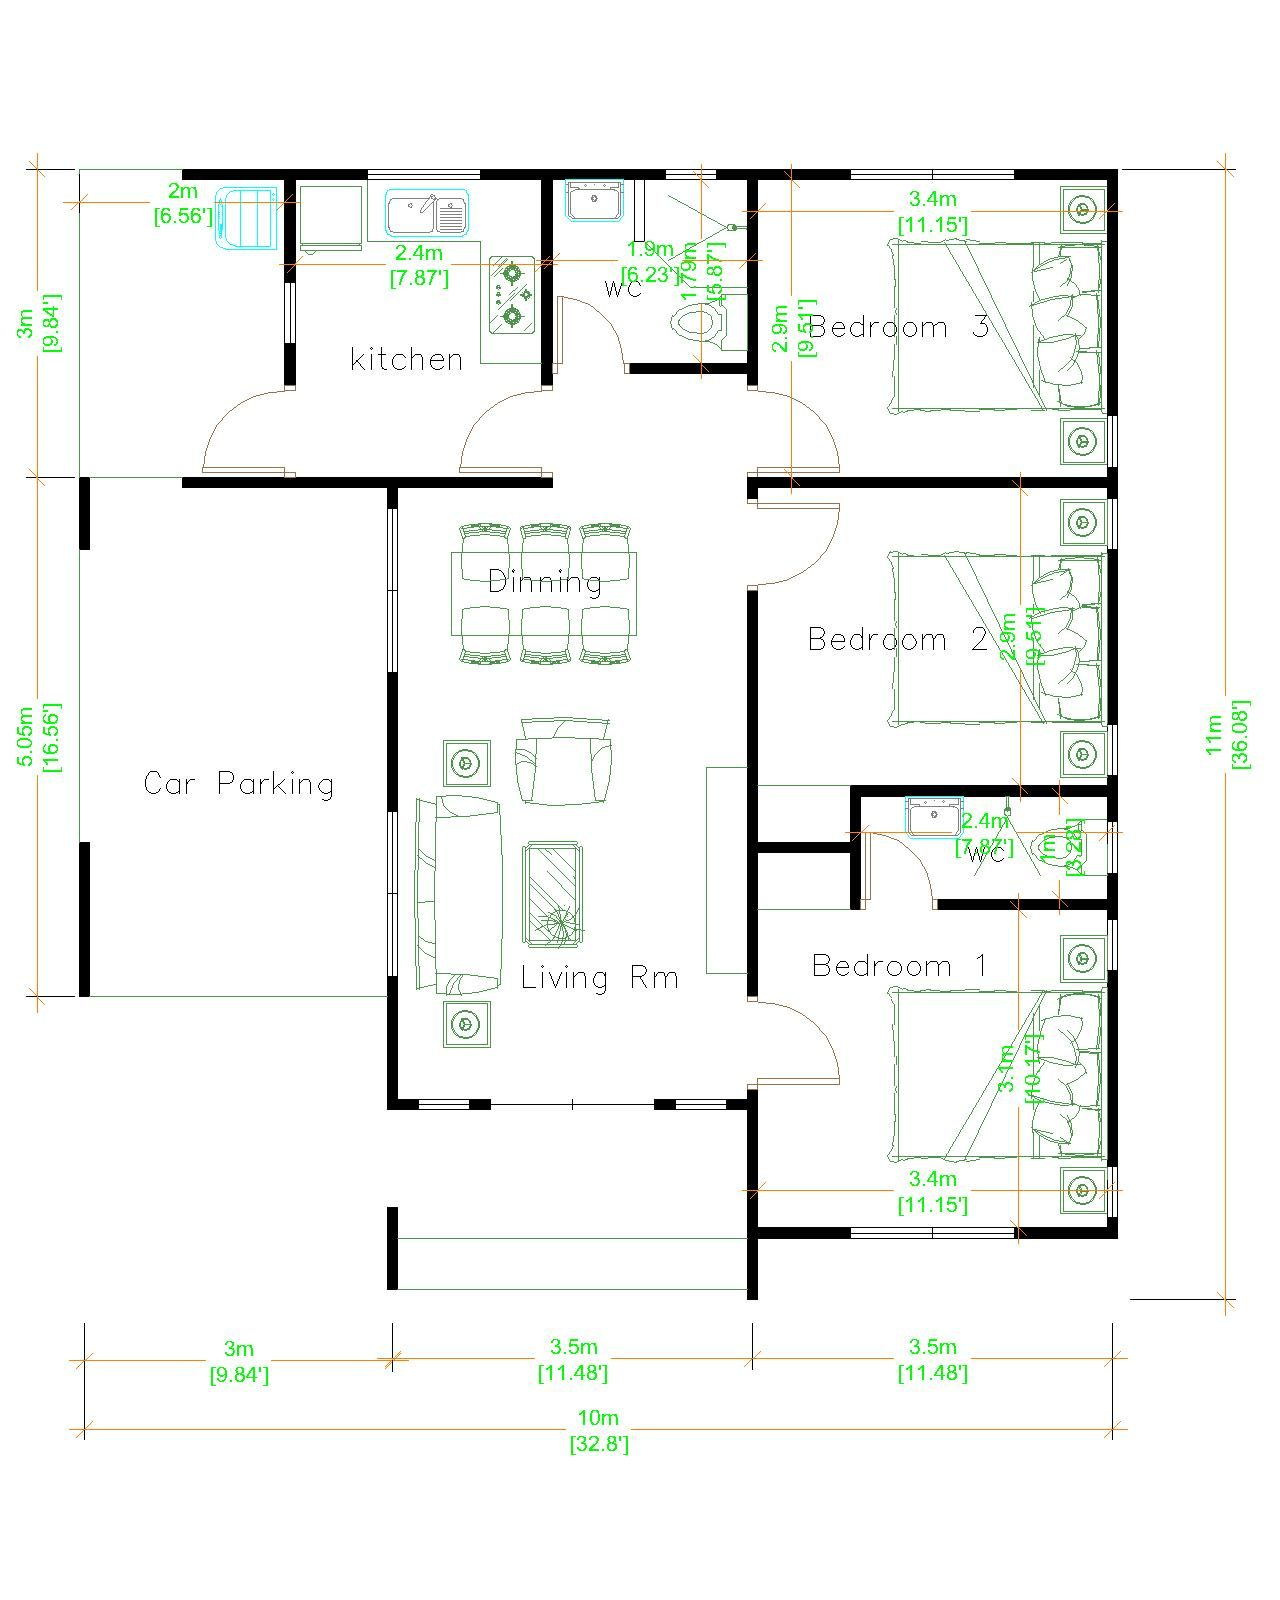 One Storey House 10x11 Meter 33x36 Feet 3 Beds Layout floor plan